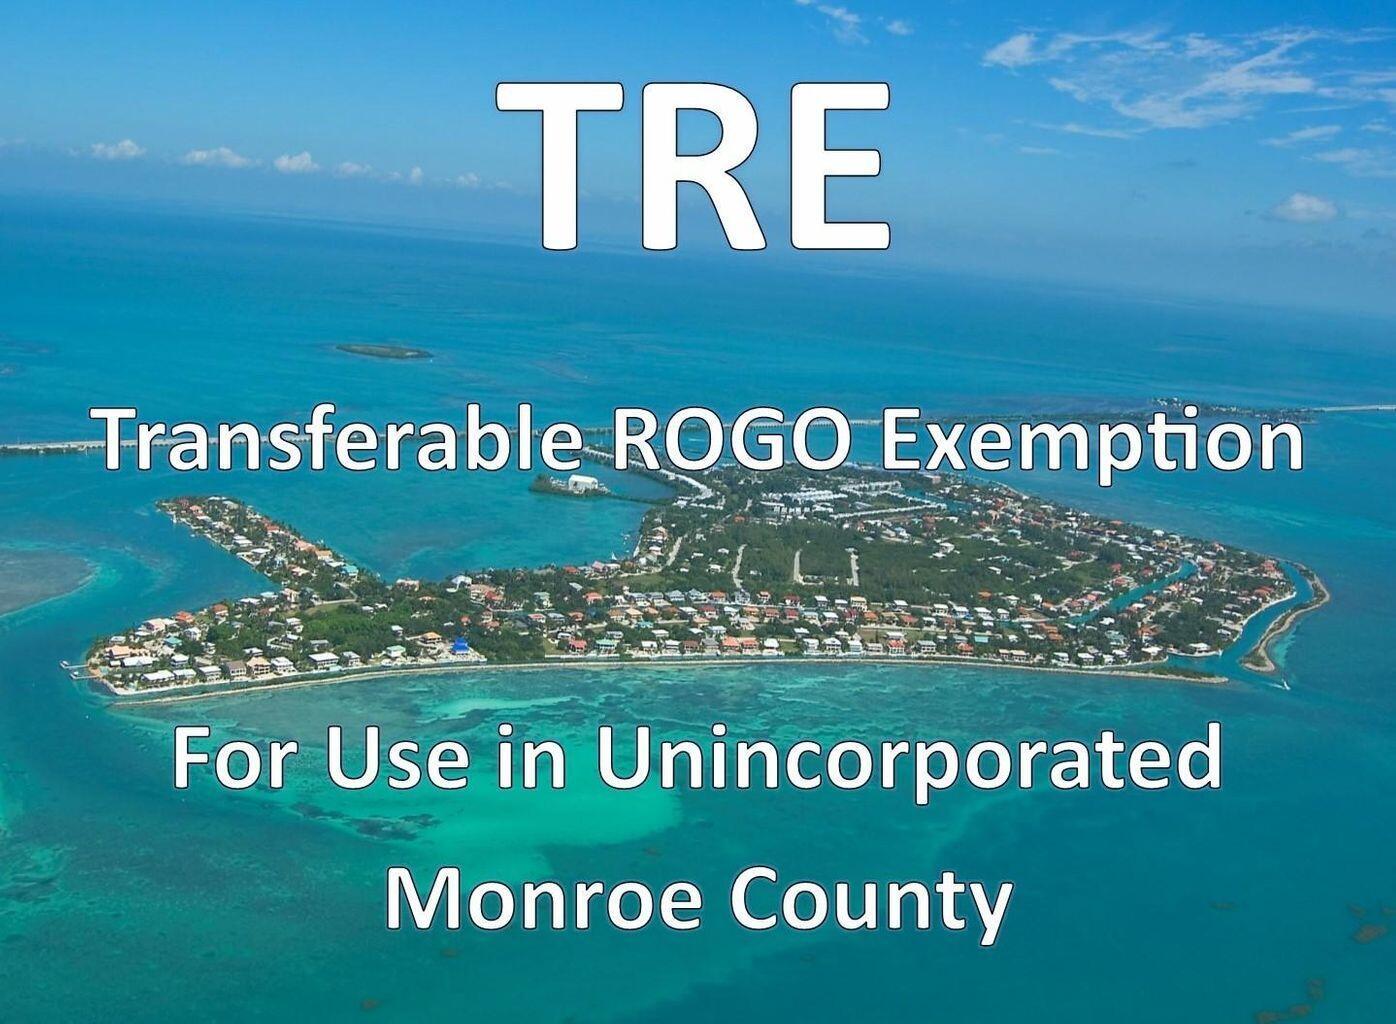 17 Transferable Rogo Exemptions Property Photo 1